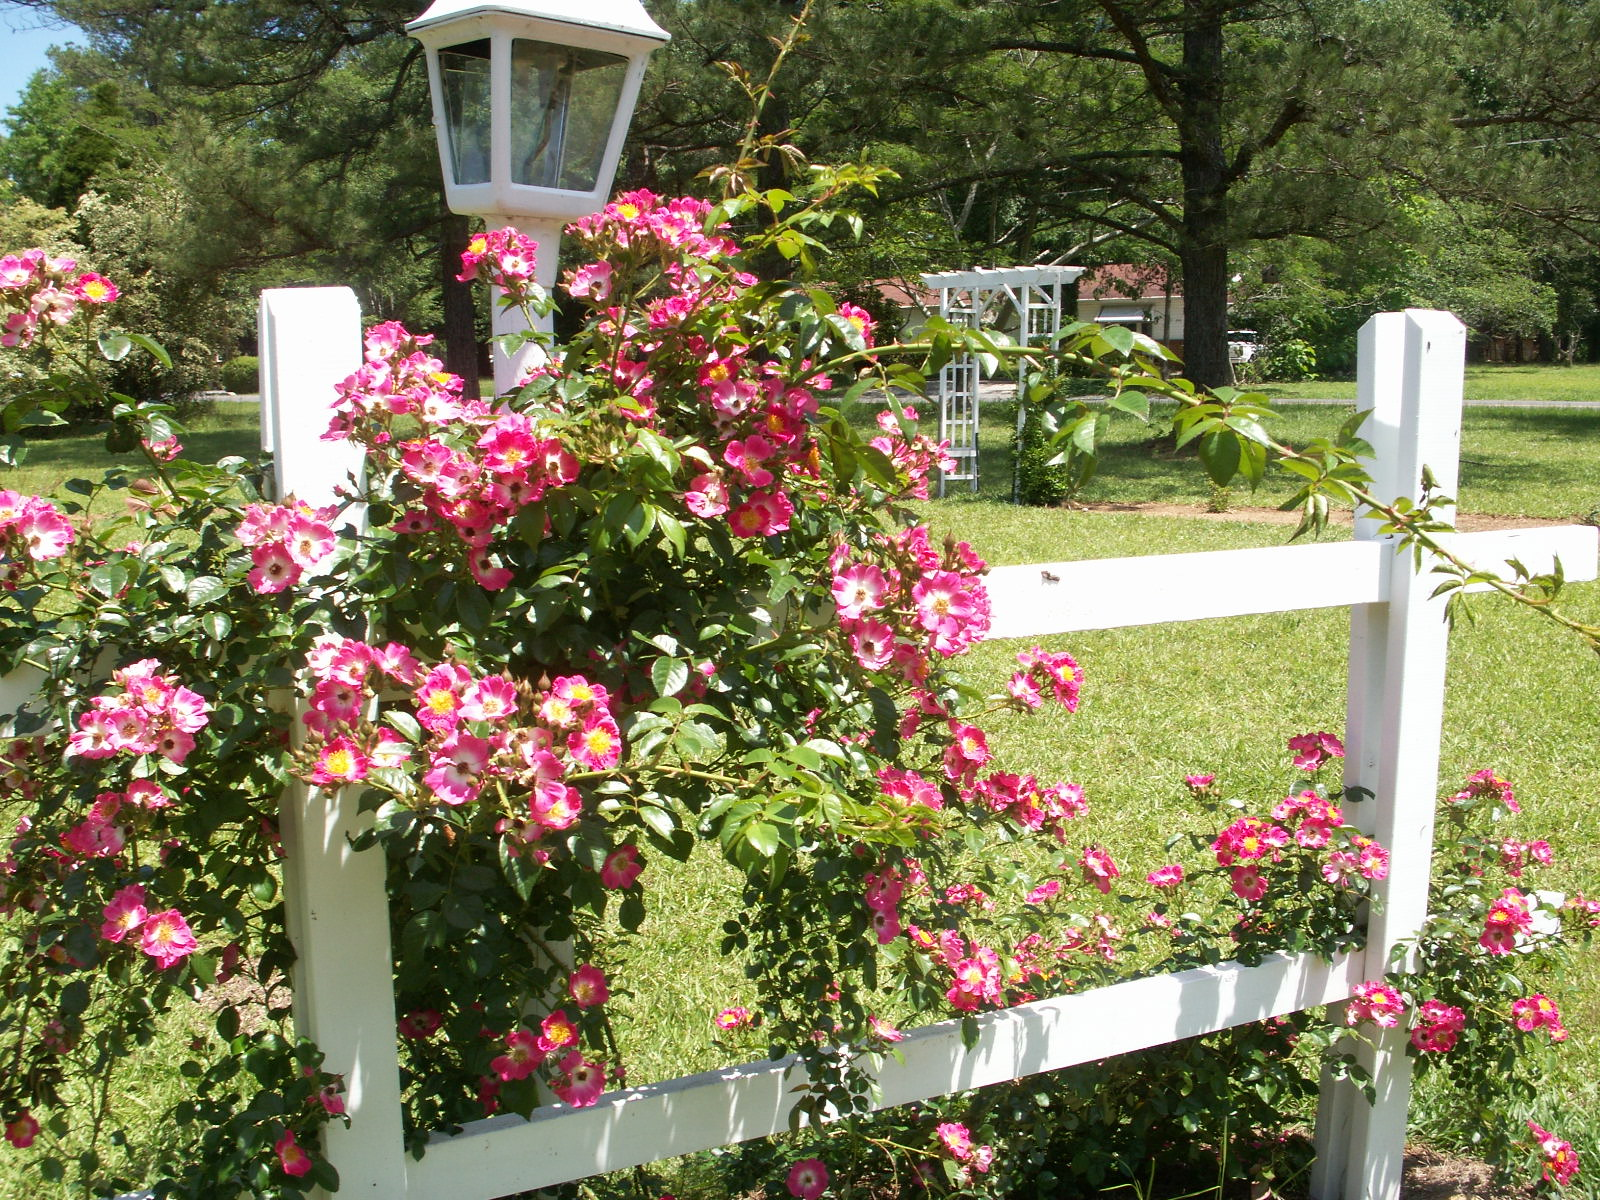 Fall String Lights Wallpaper Weddings Garden Wedding Ideas Wedding Flowers The Old Farmer S